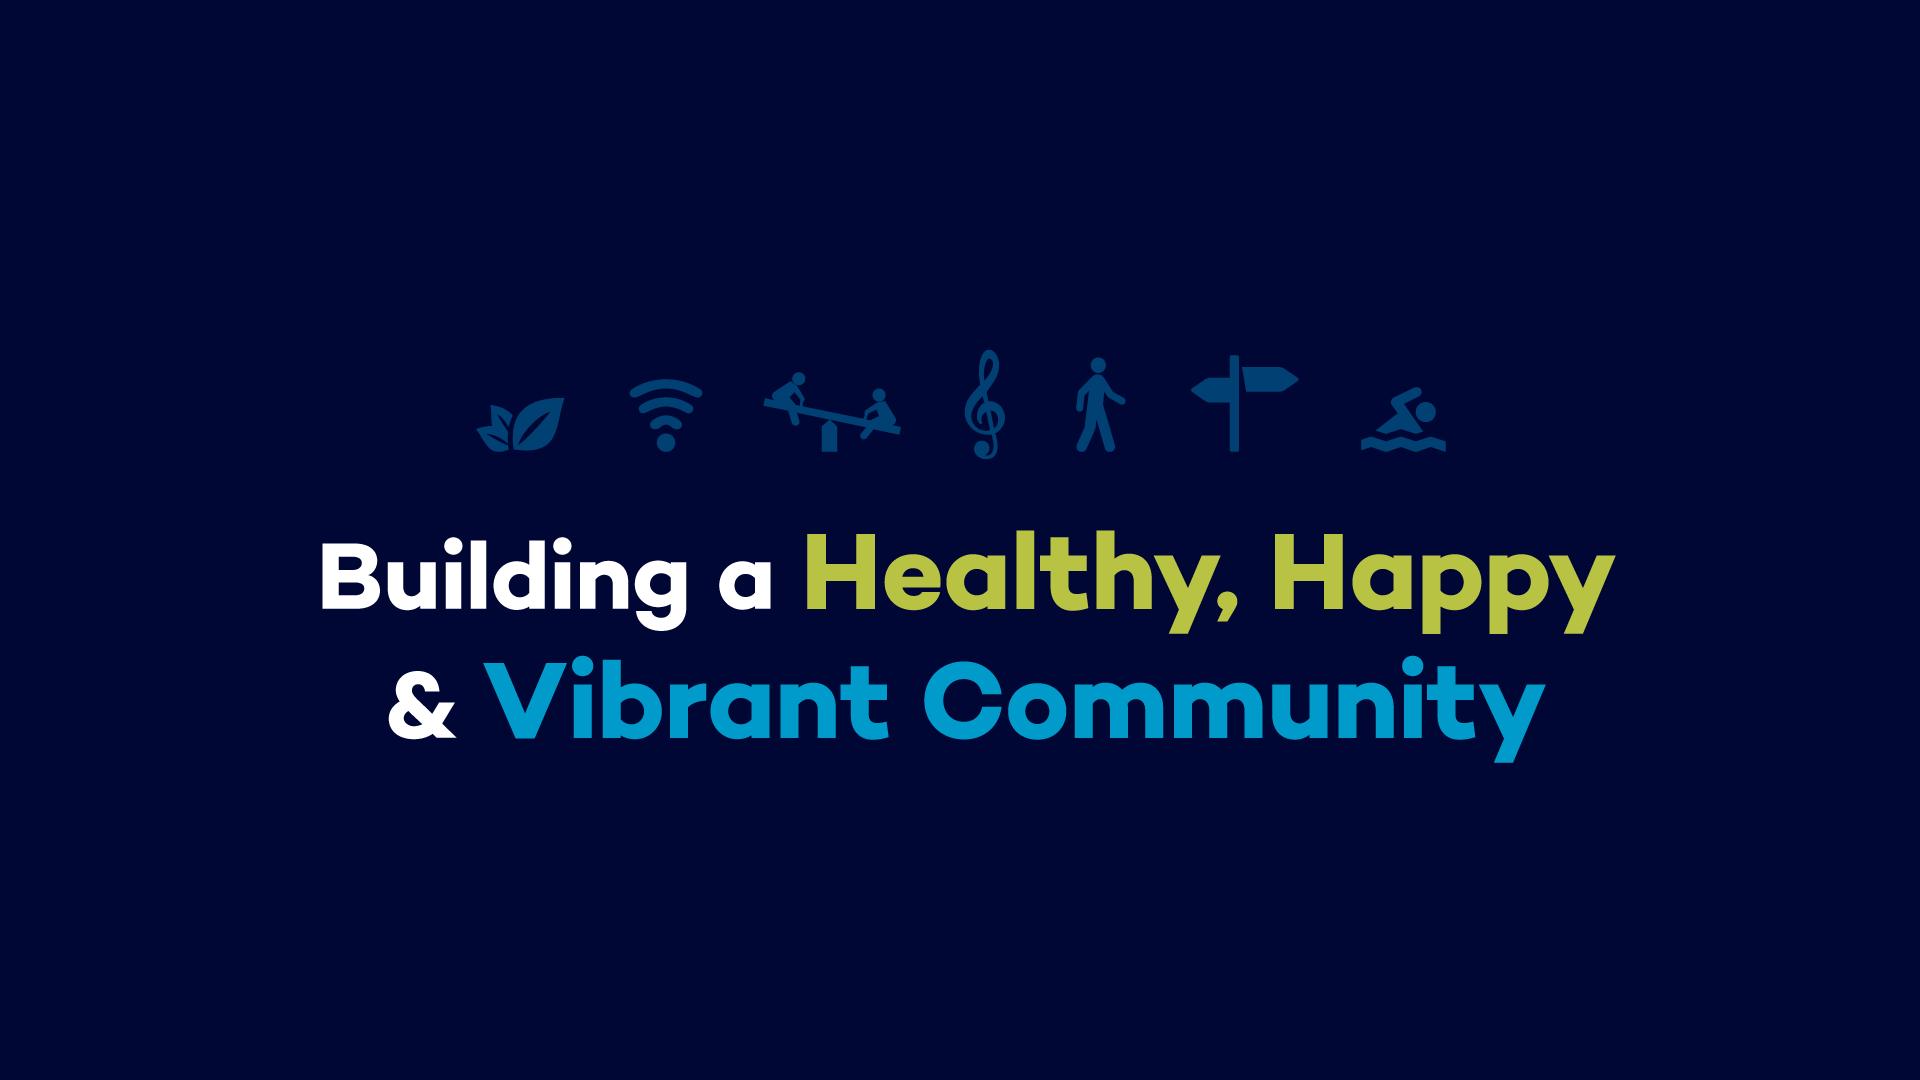 Vibrant-Community.png